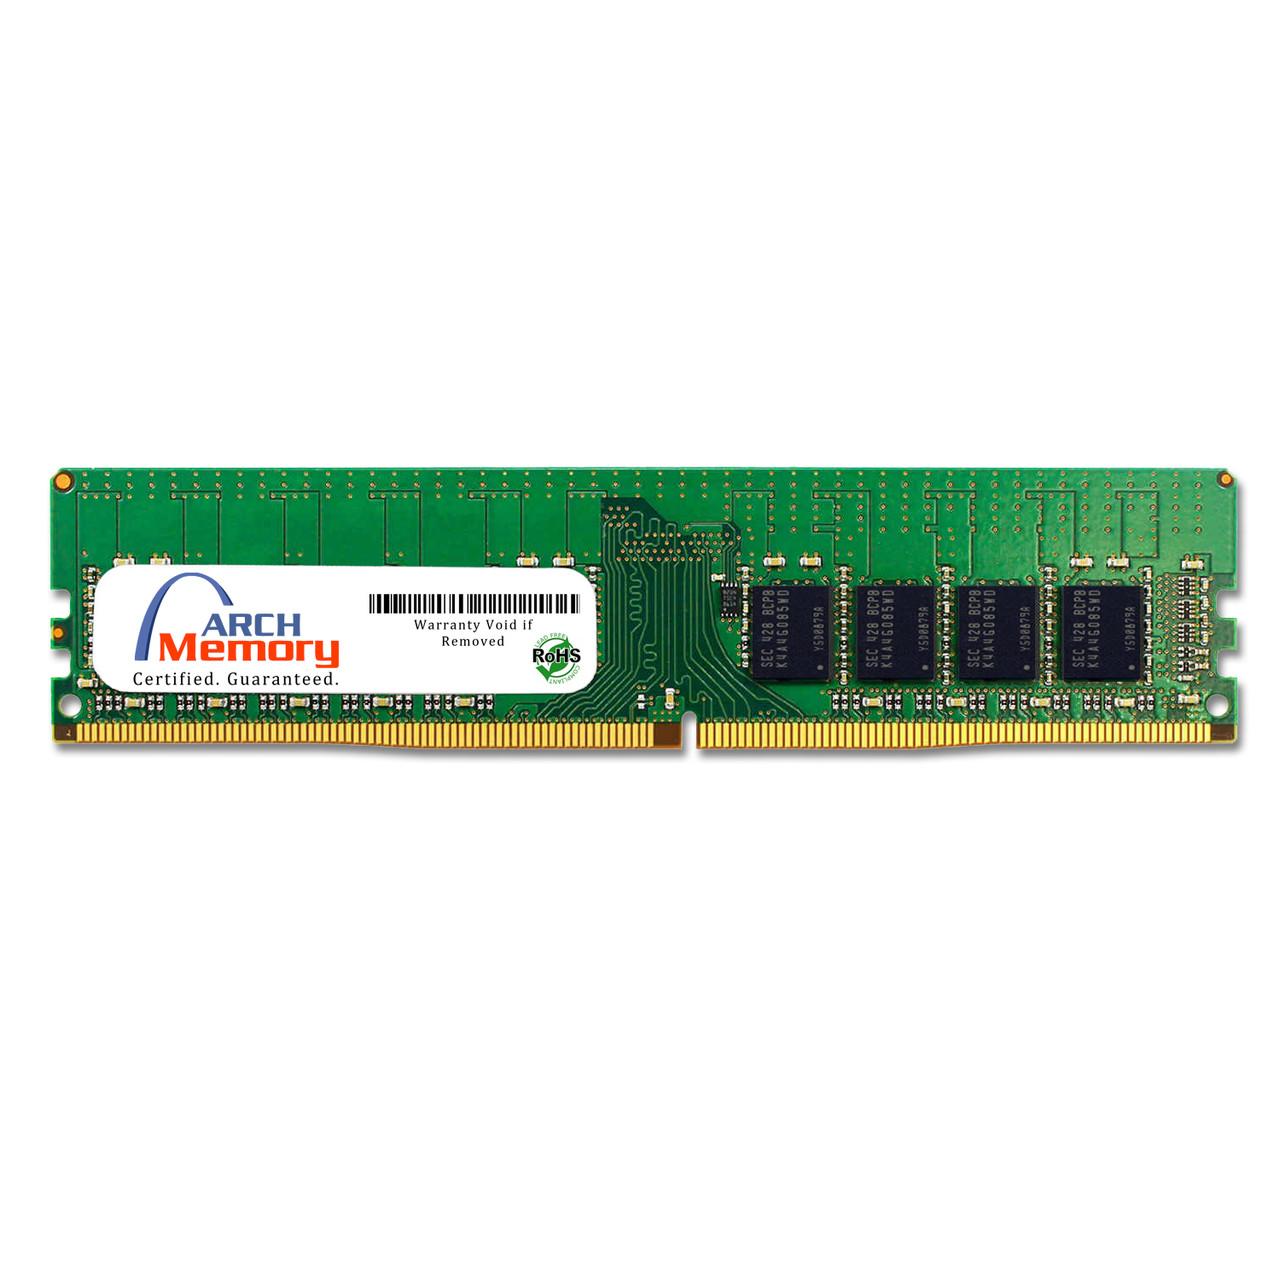 16GB 288-Pin DDR4-2400 PC4-19200 ECC UDIMM (2Rx8) RAM | Arch Memory